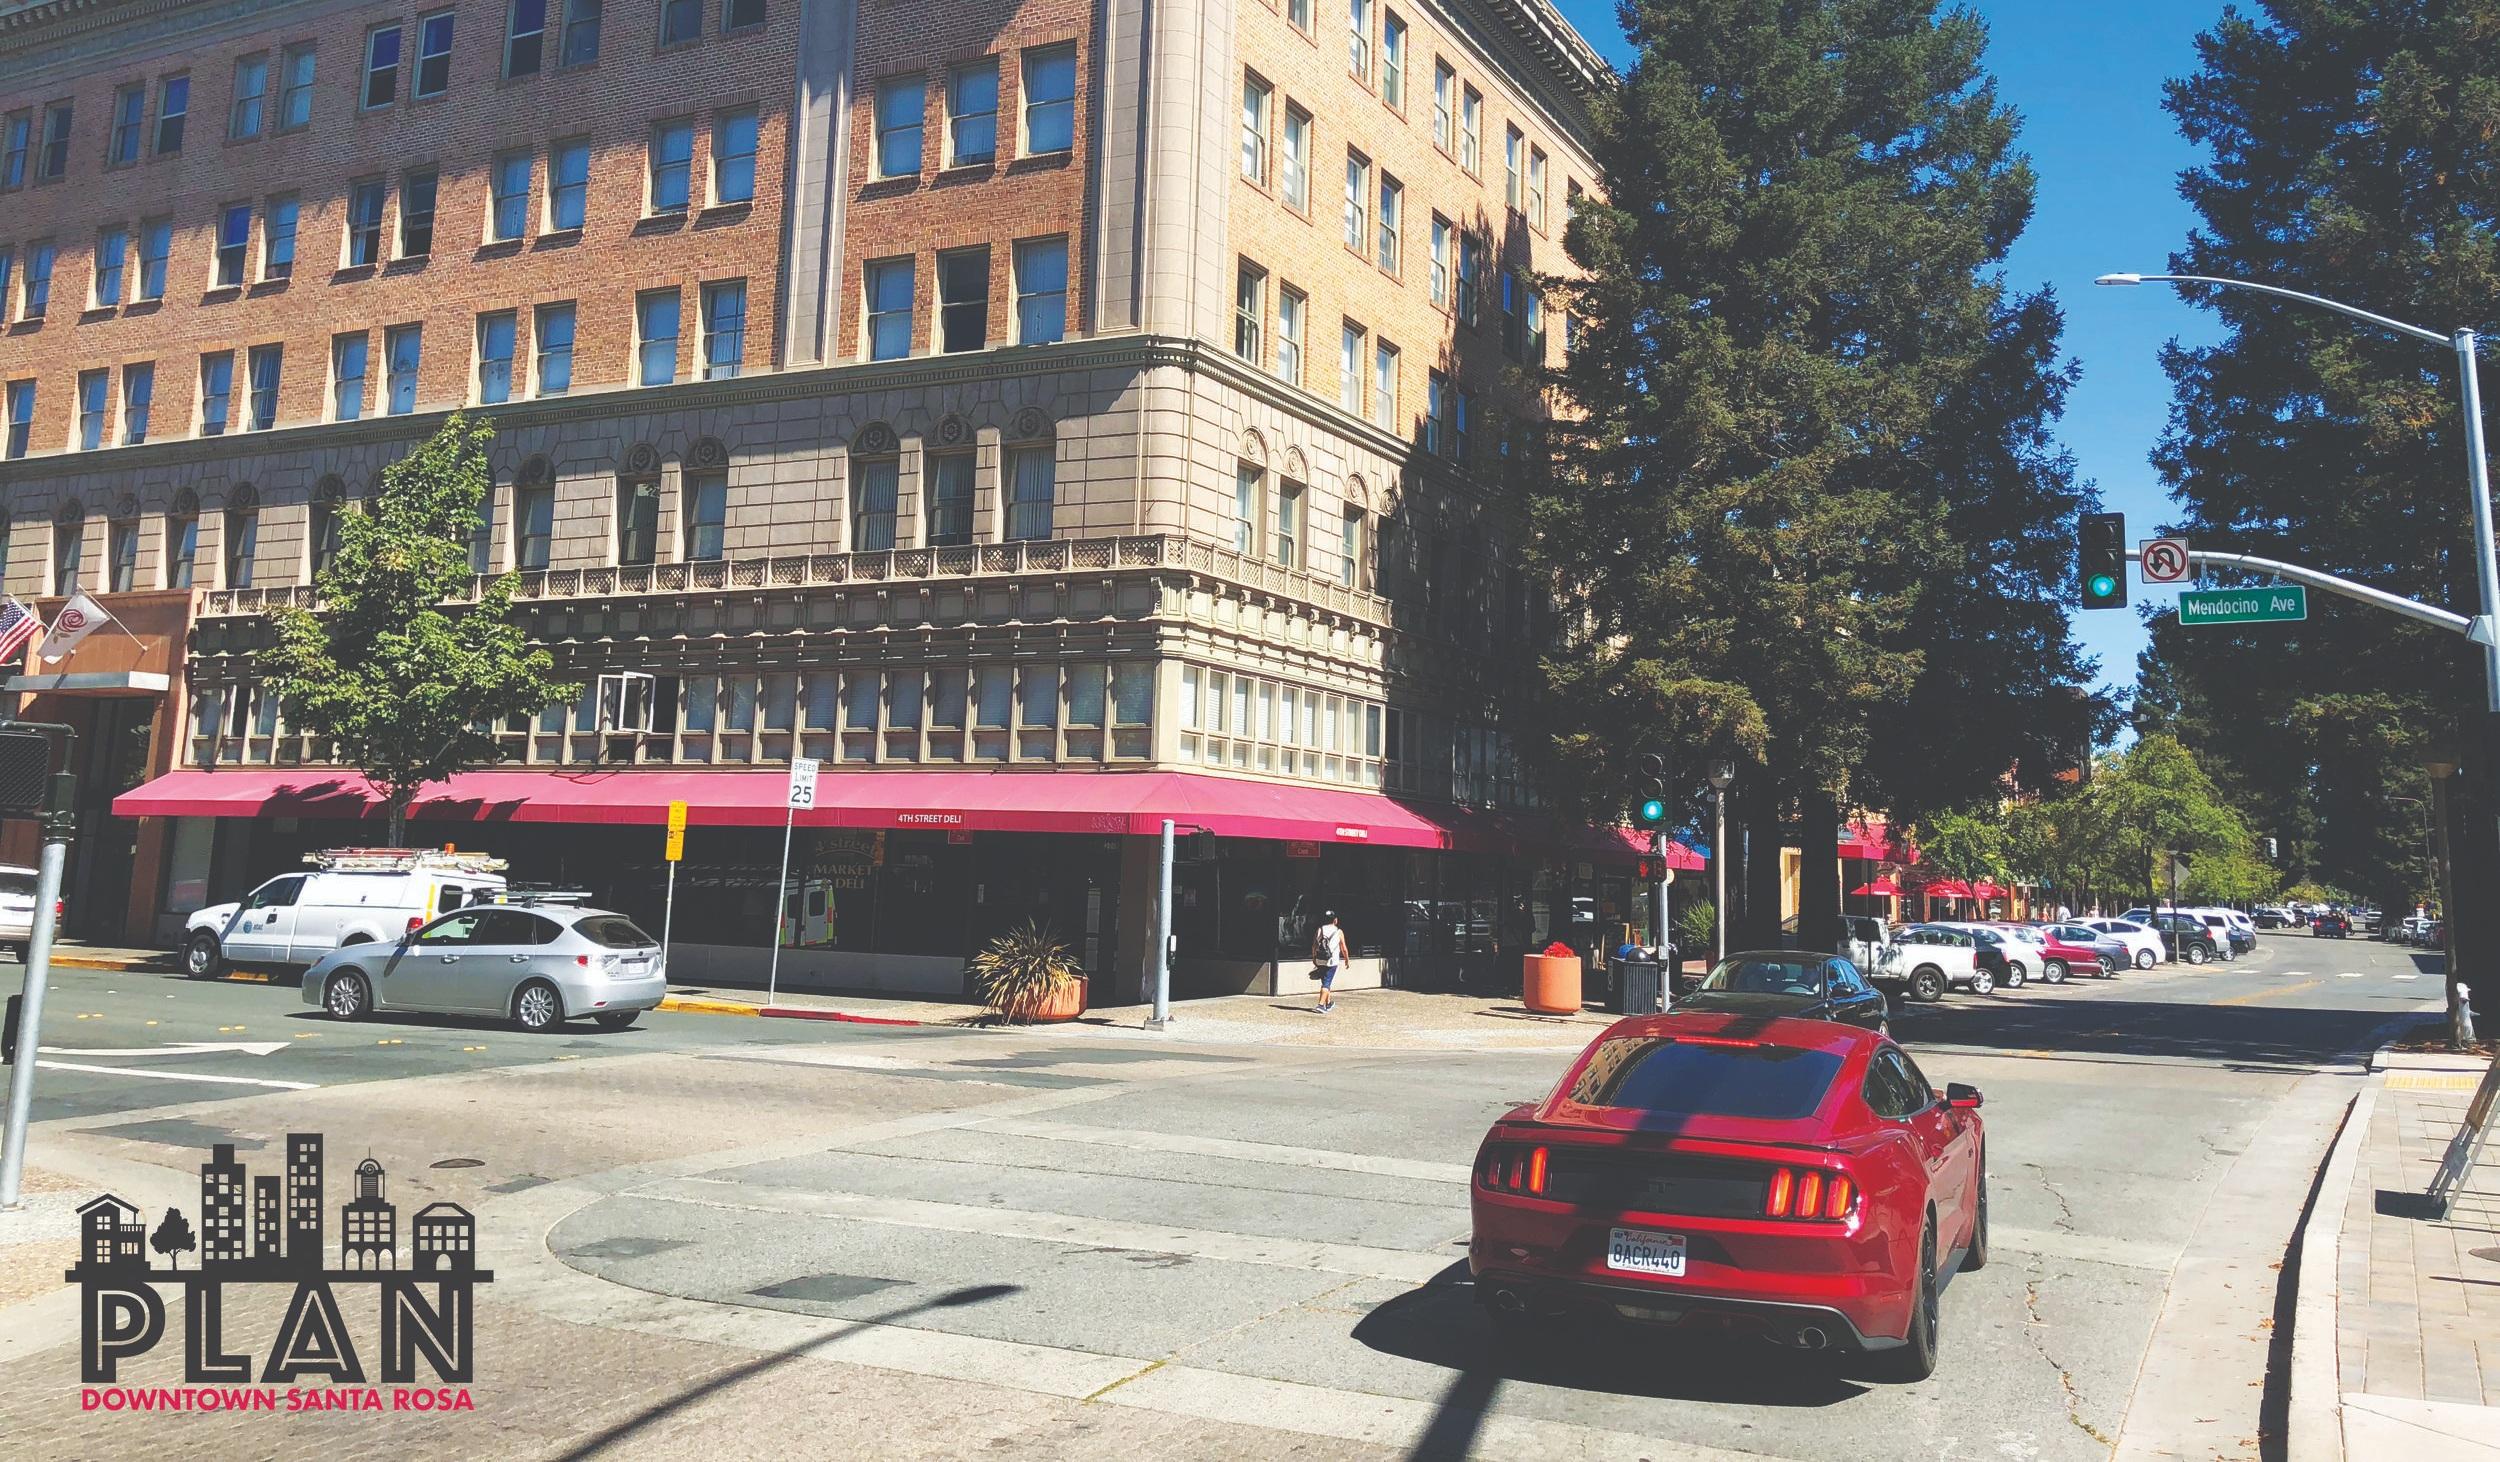 DowntownSURVEY -